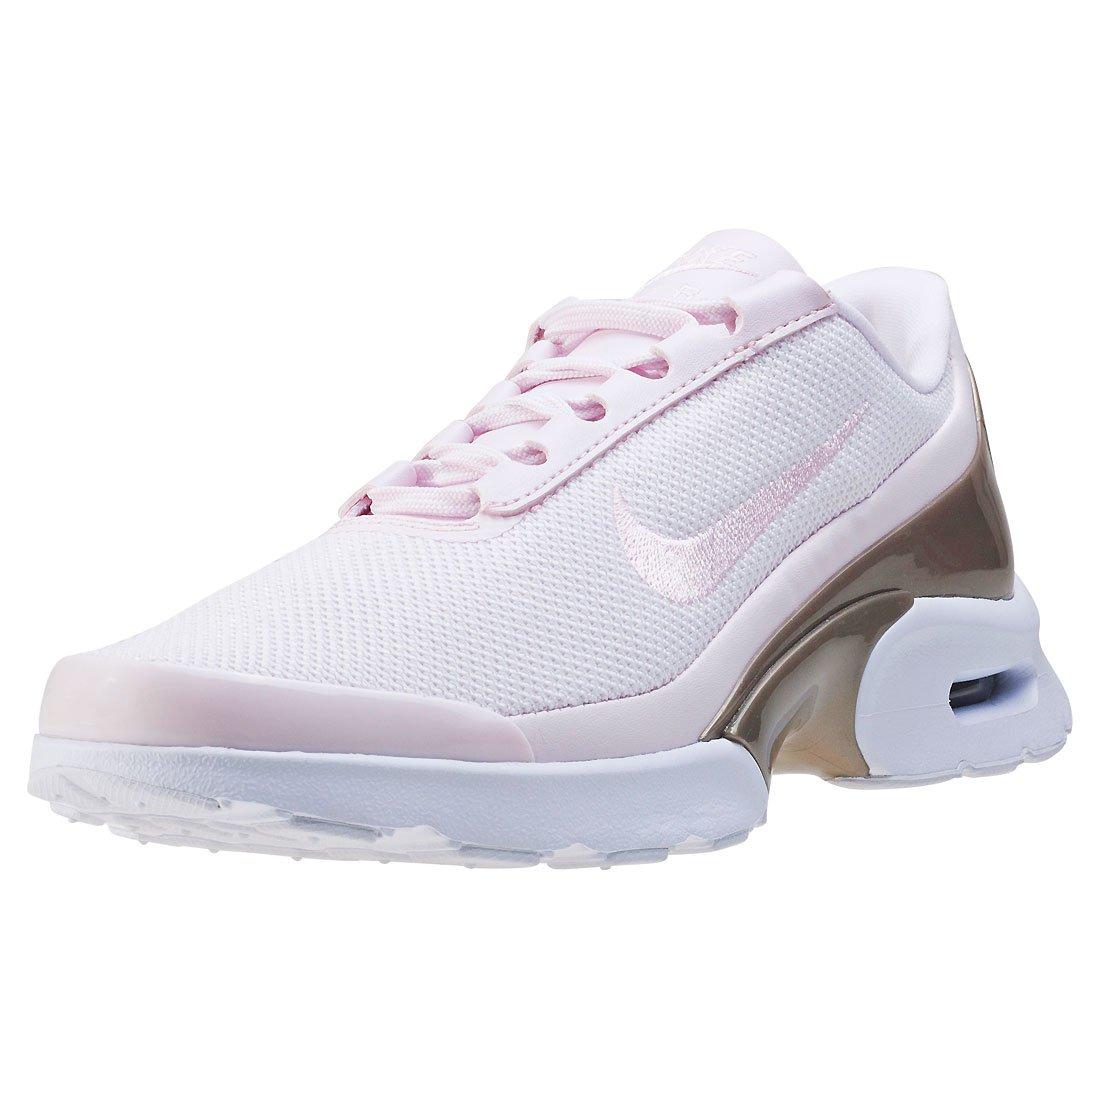 Details zu Damen Nike Air Max Jewell Prm Weiße Sportschuhe 904576 100